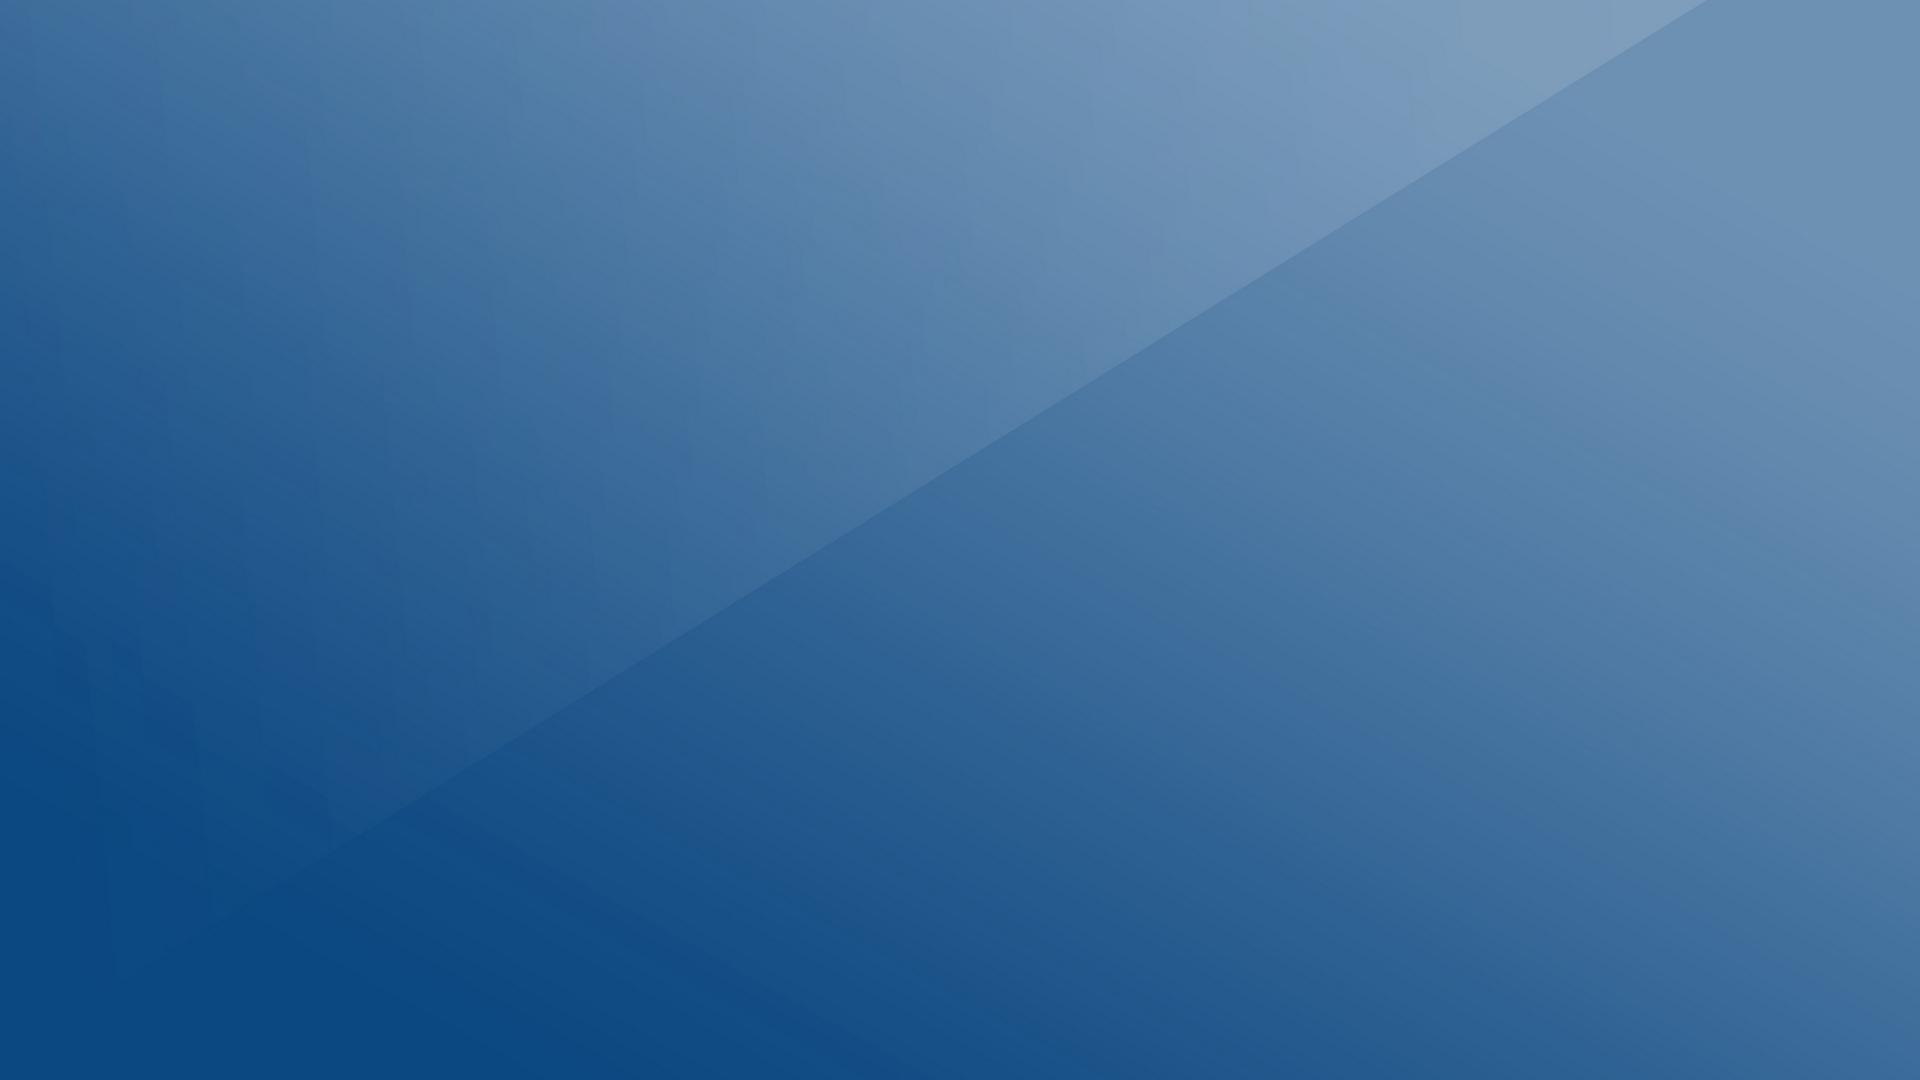 Download wallpaper 1920x1080 blue light line full hd hdtv fhd 1920x1080